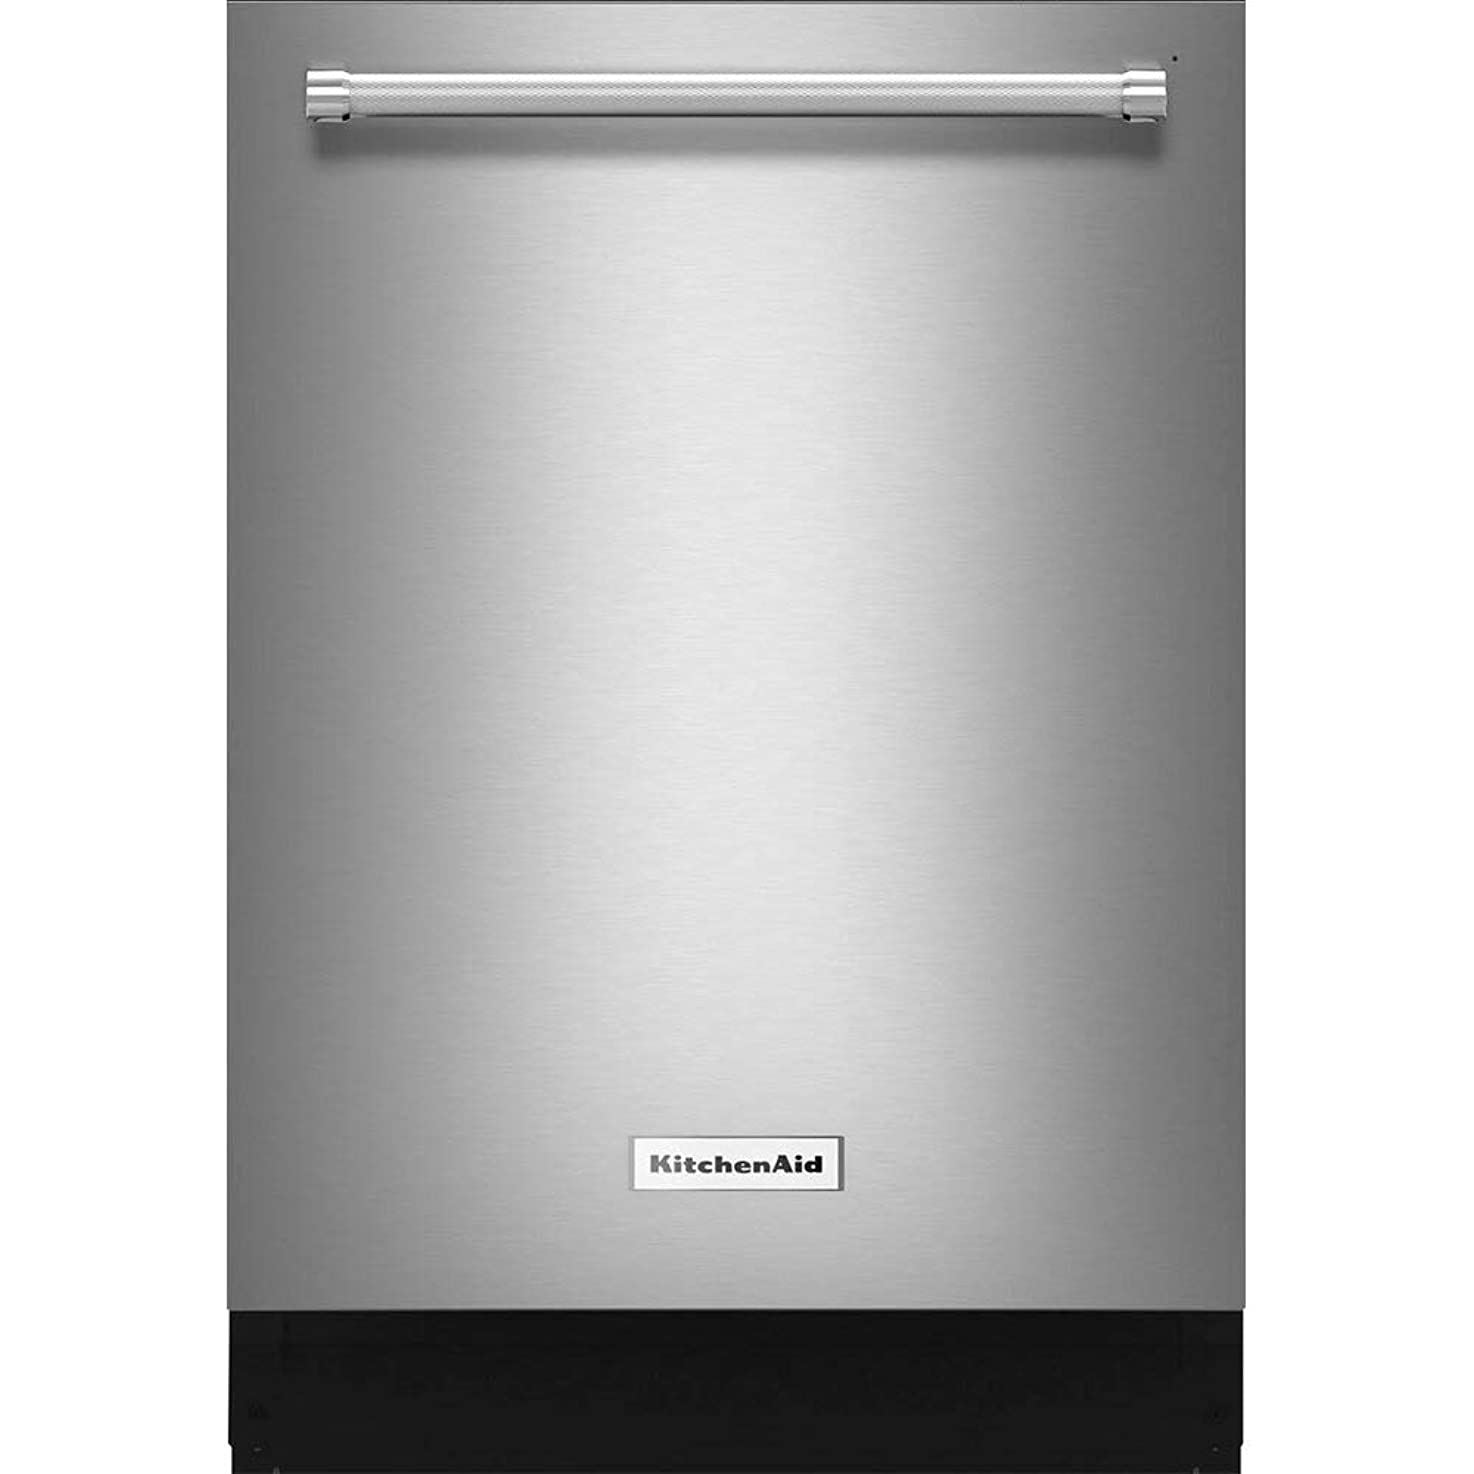 KitchenAid KDTE334GPS 39dB Stainless Built-in Dishwasher with Third Rack (Renewed) wnzyocxmuegtk7